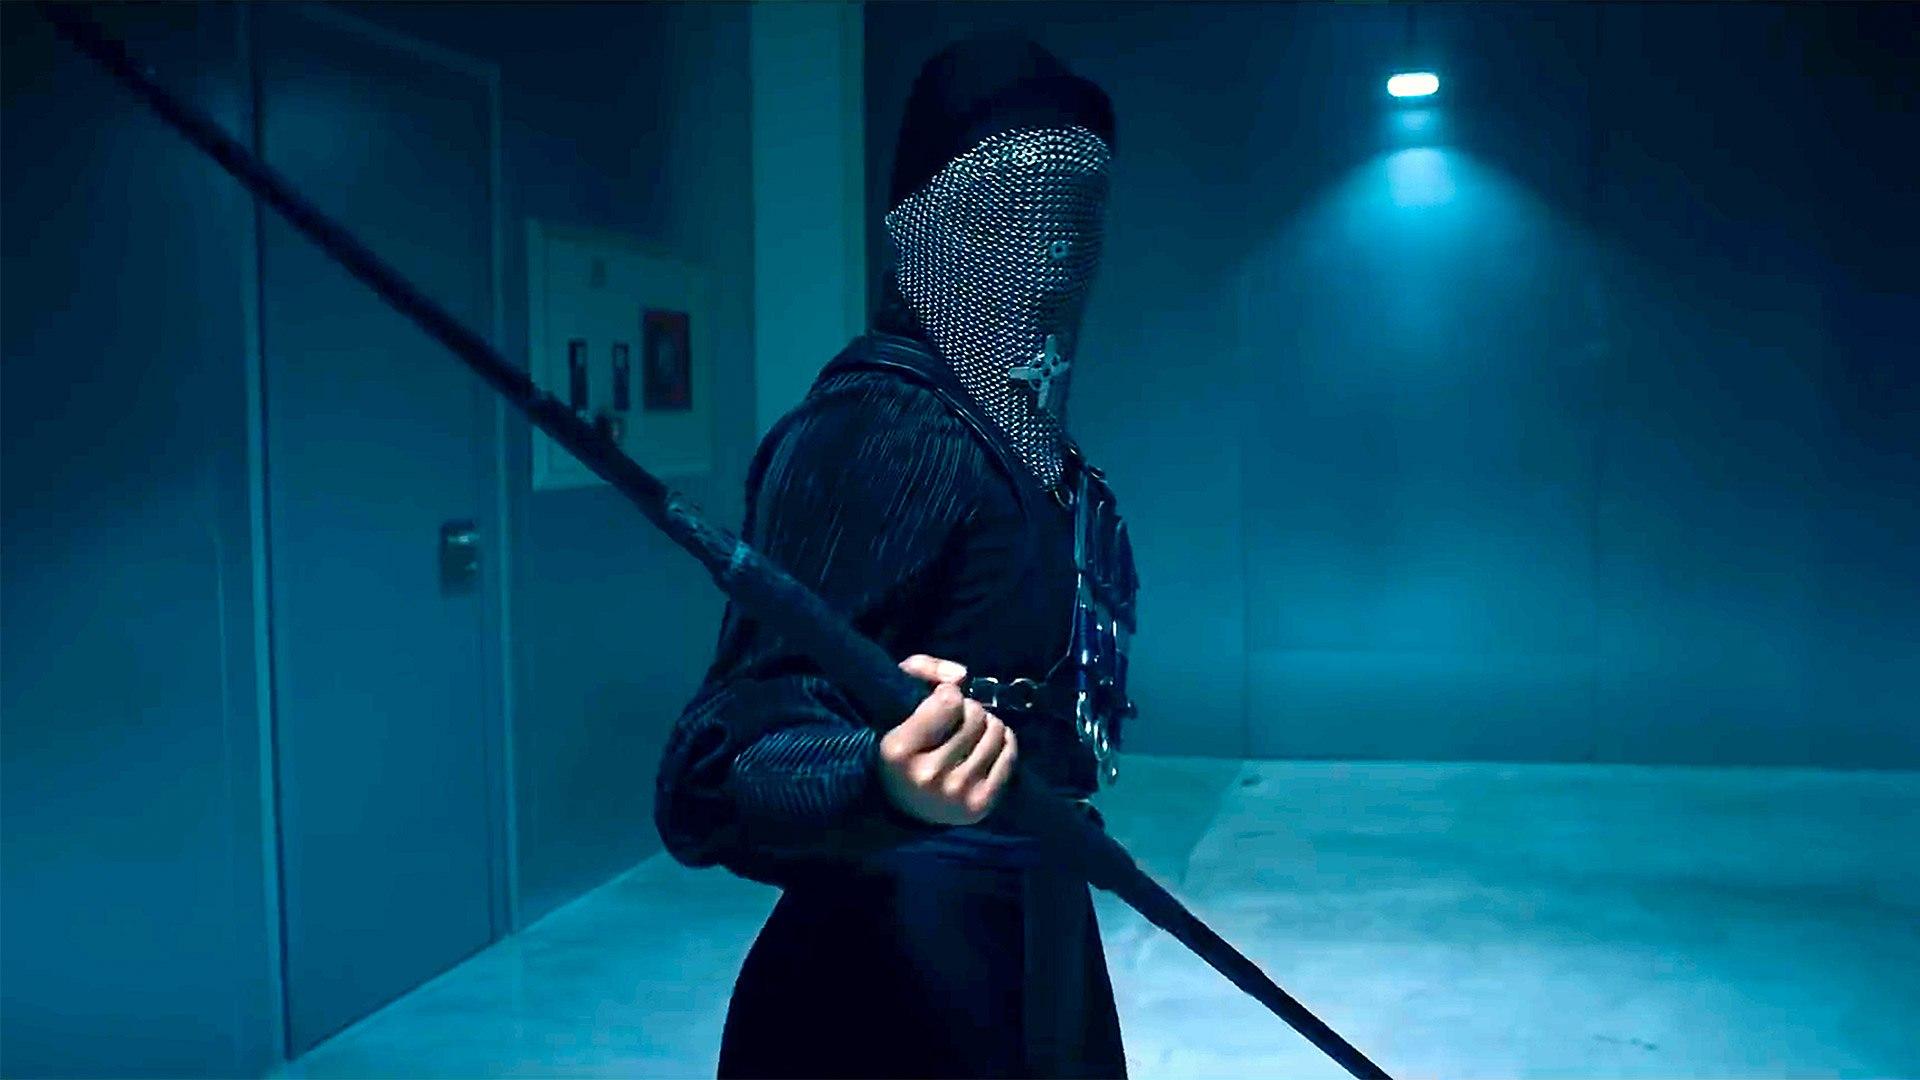 Warrior Nun on Netflix - Official Trailer - video Dailymotion